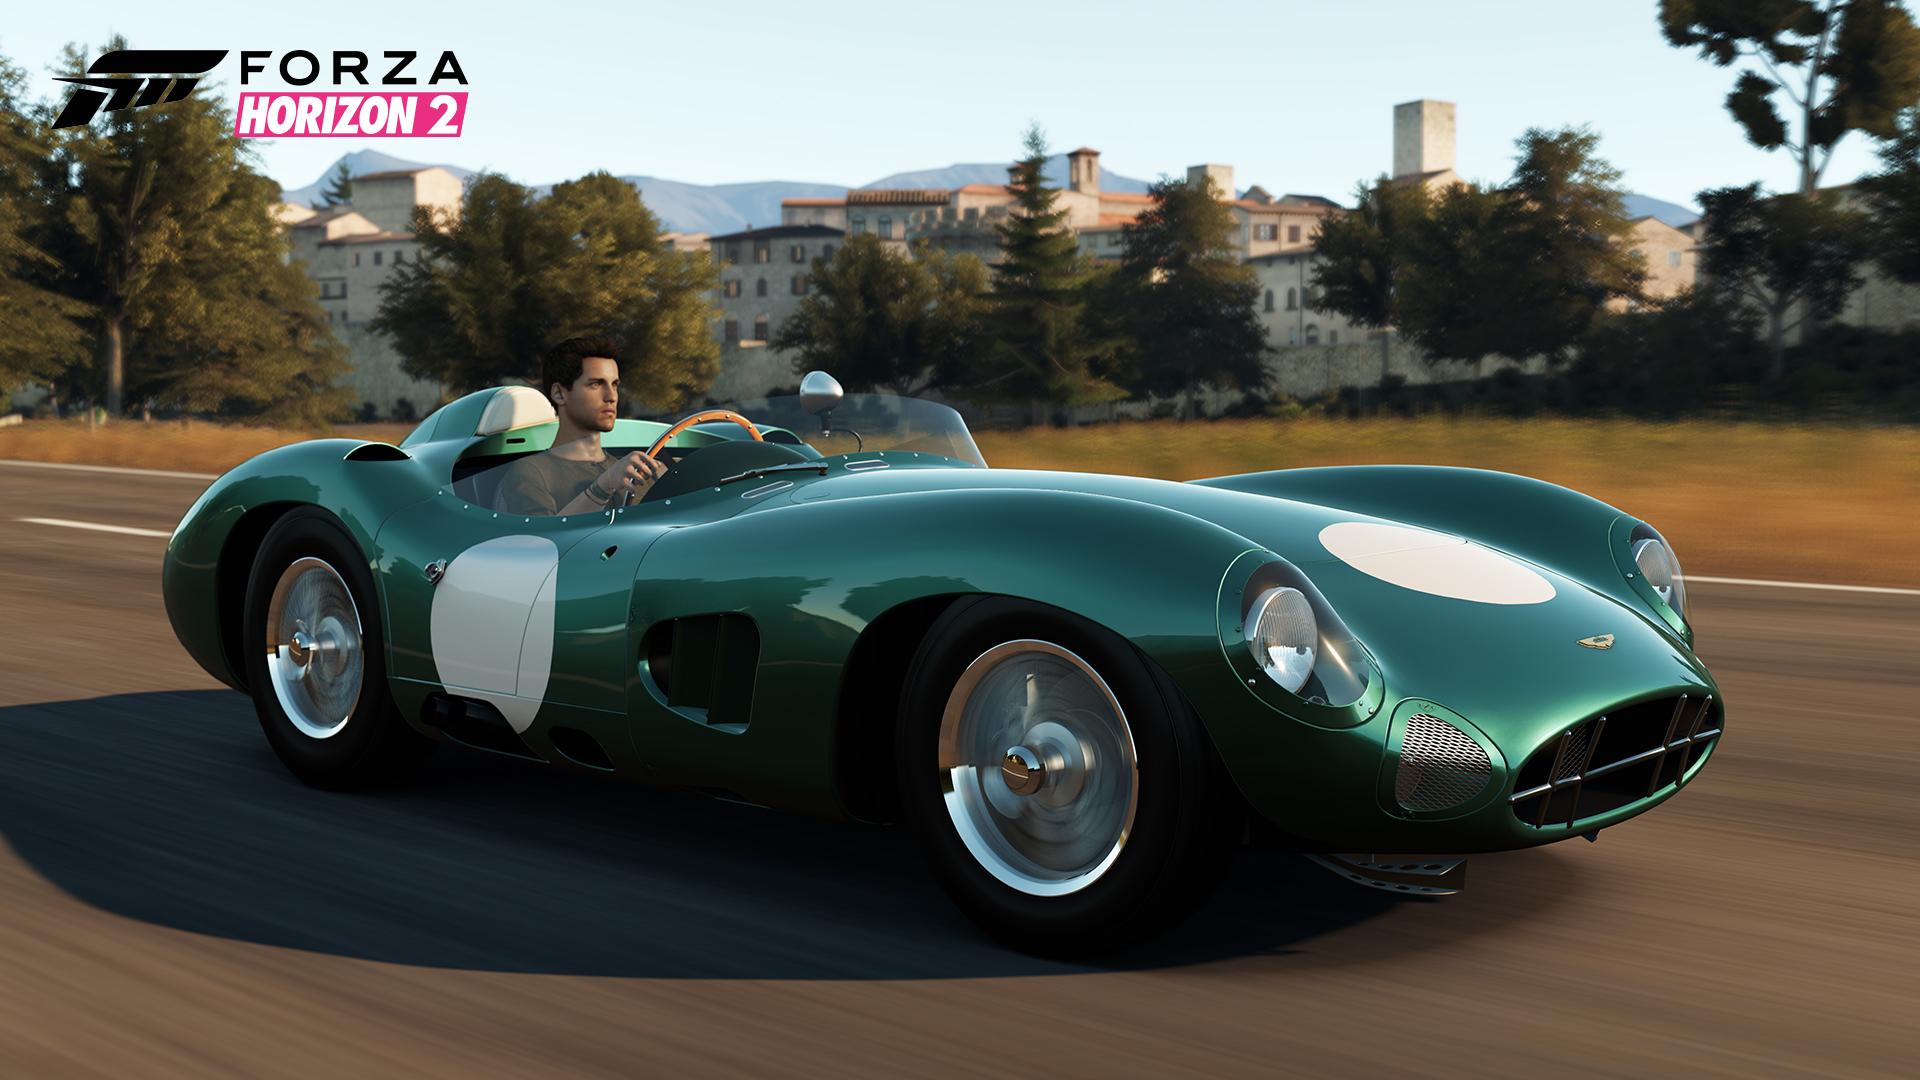 More Forza Horizon 2 Cars Revealed